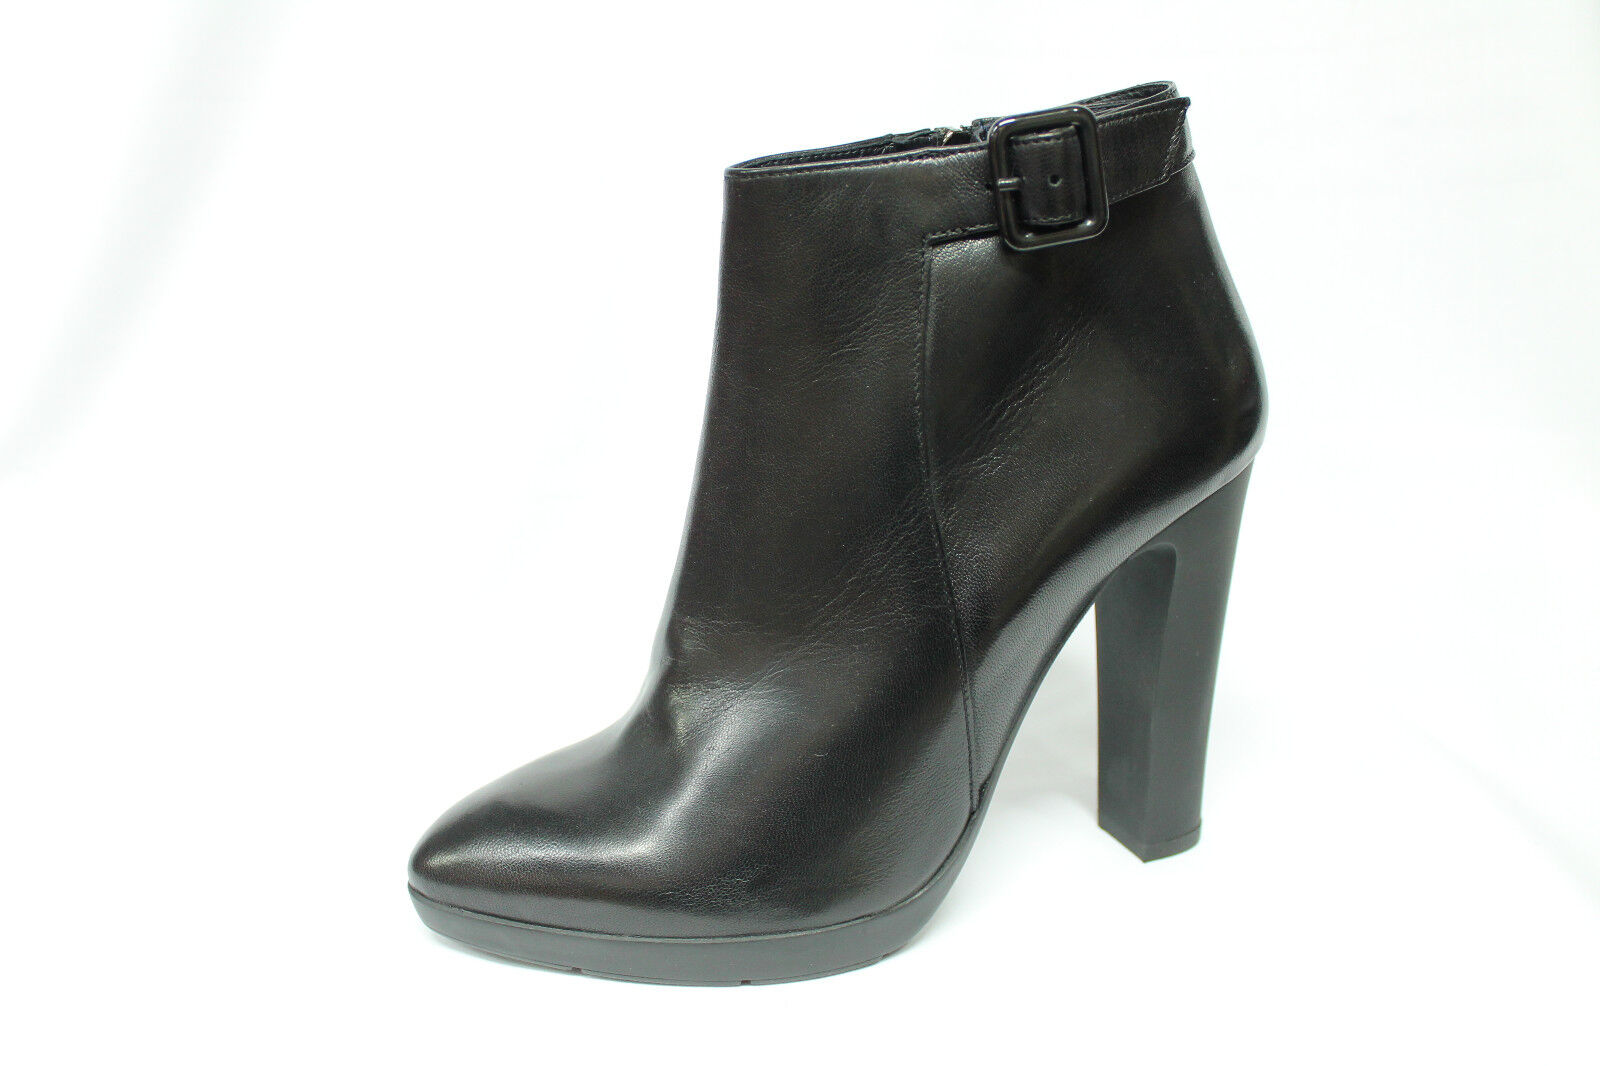 Tronchetti con plateau Frau 66P4 black Made in  listino - 20%